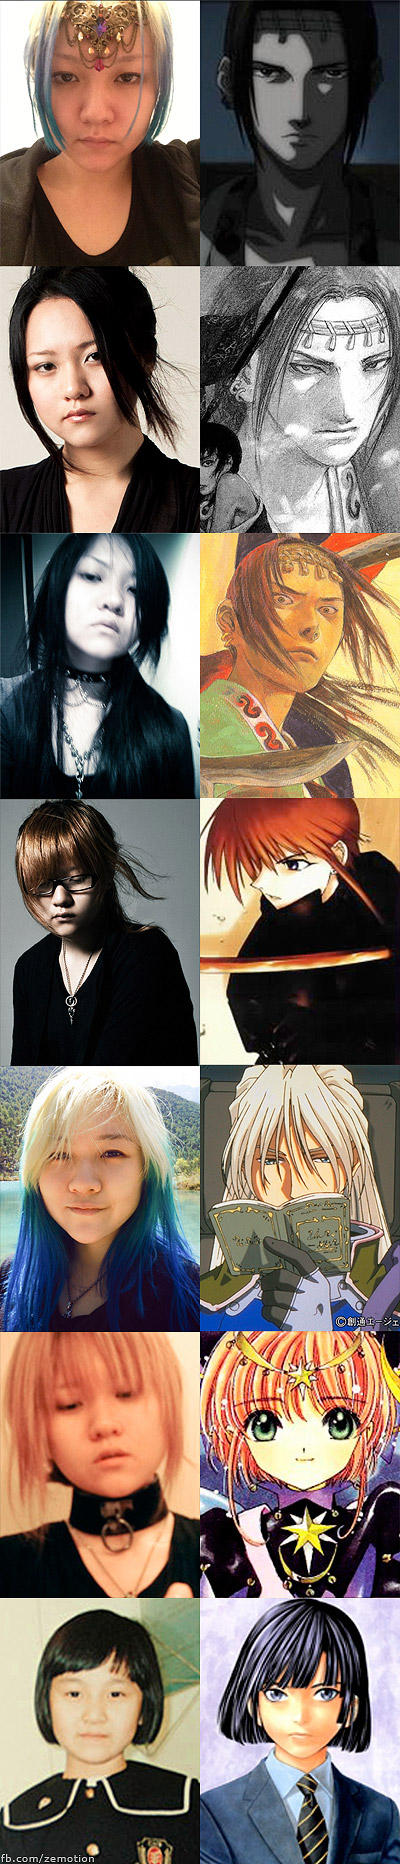 My life of anime/manga hair